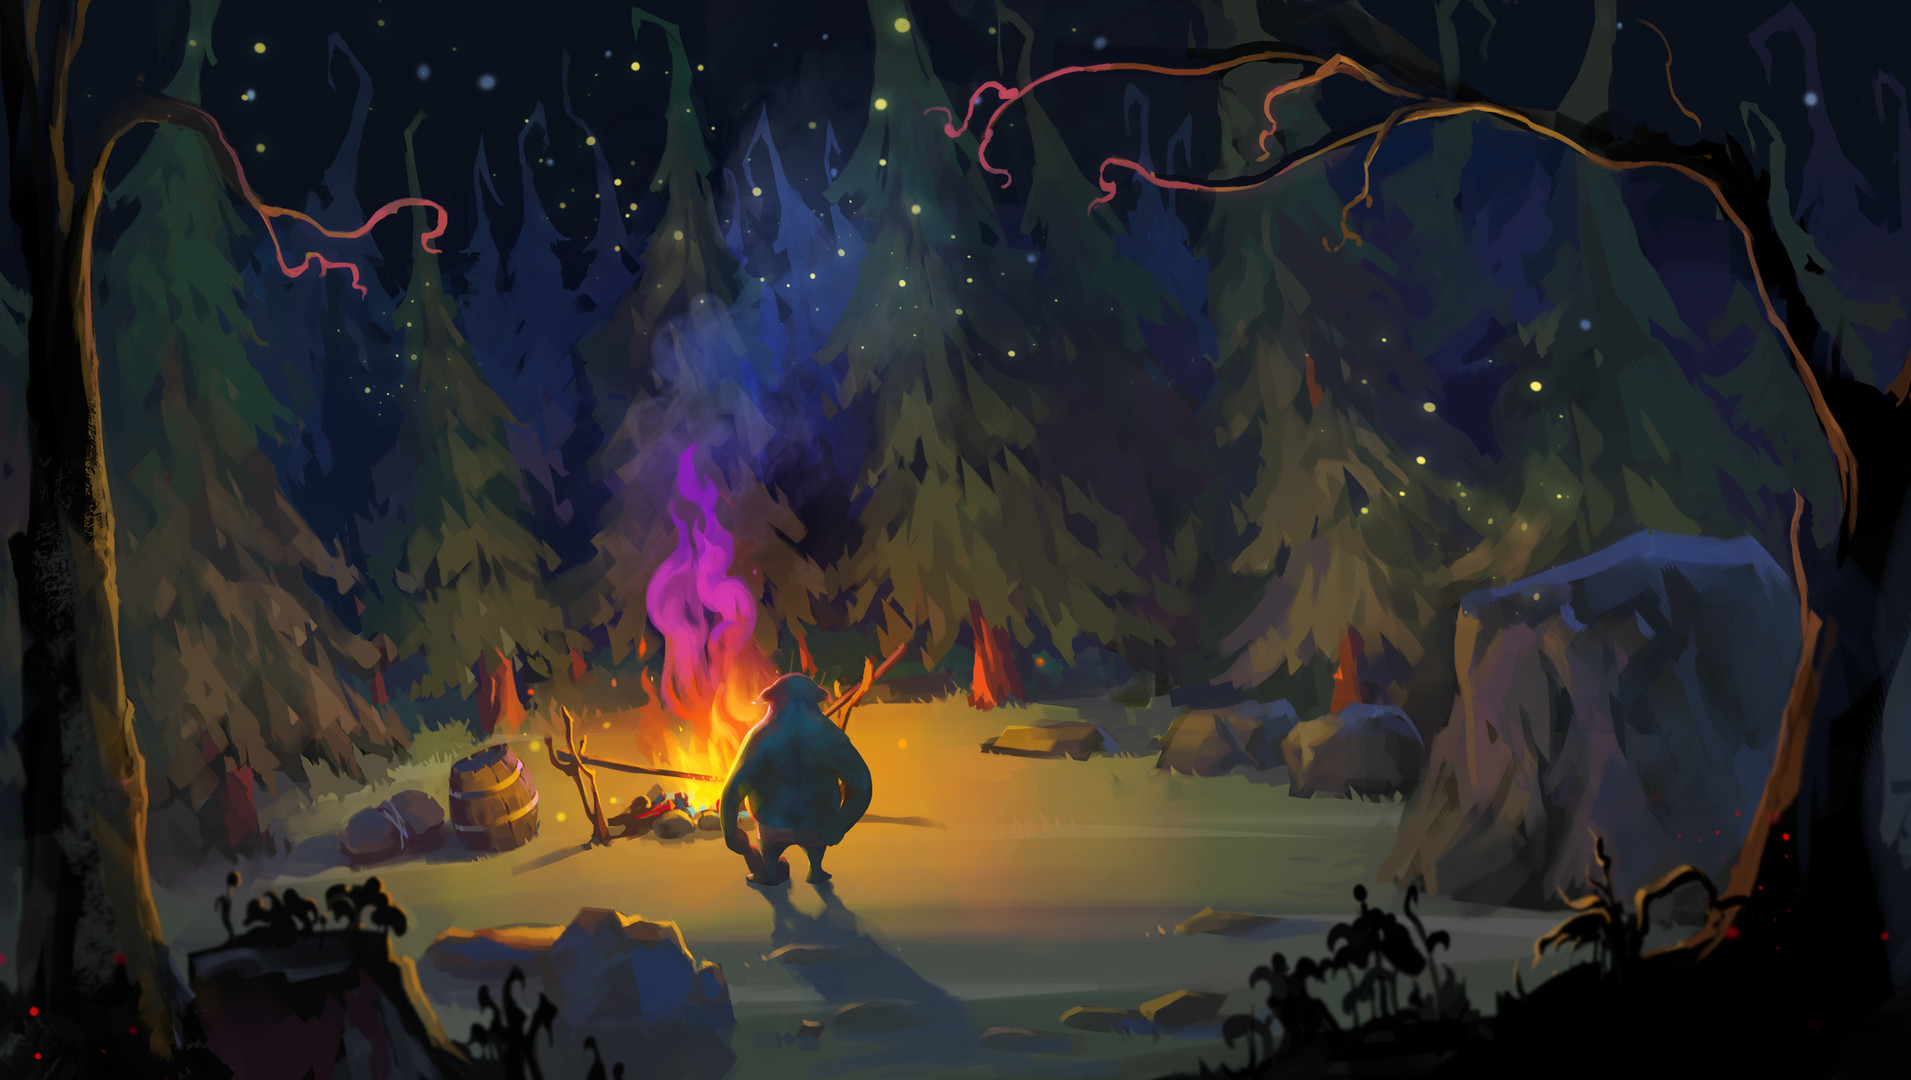 远征猎人/Quest Hunter插图15